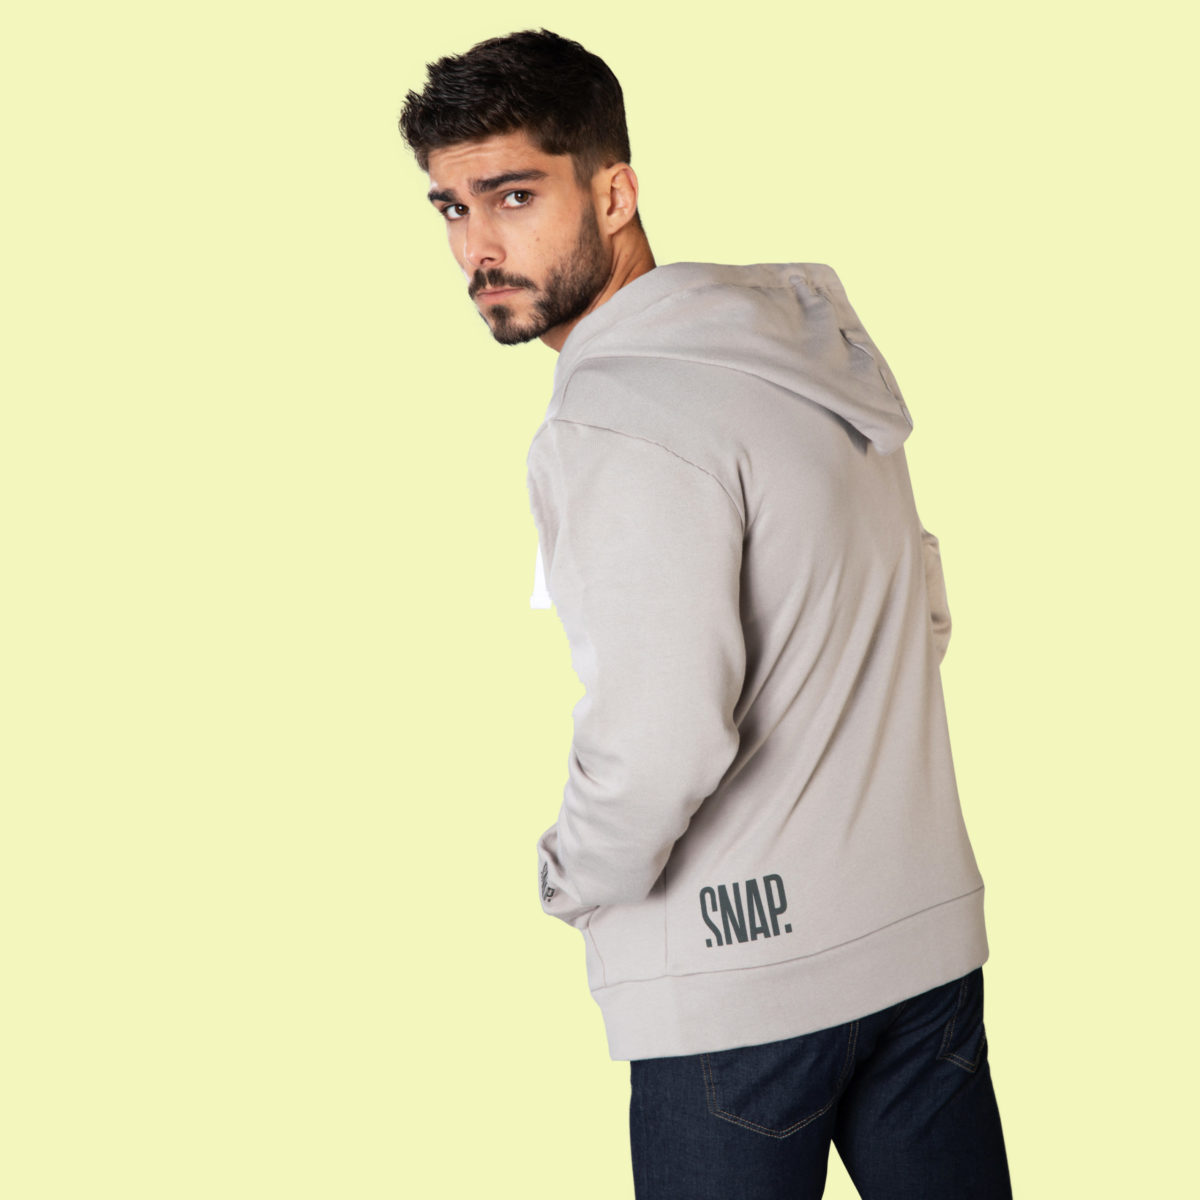 light grey hoody for men and women